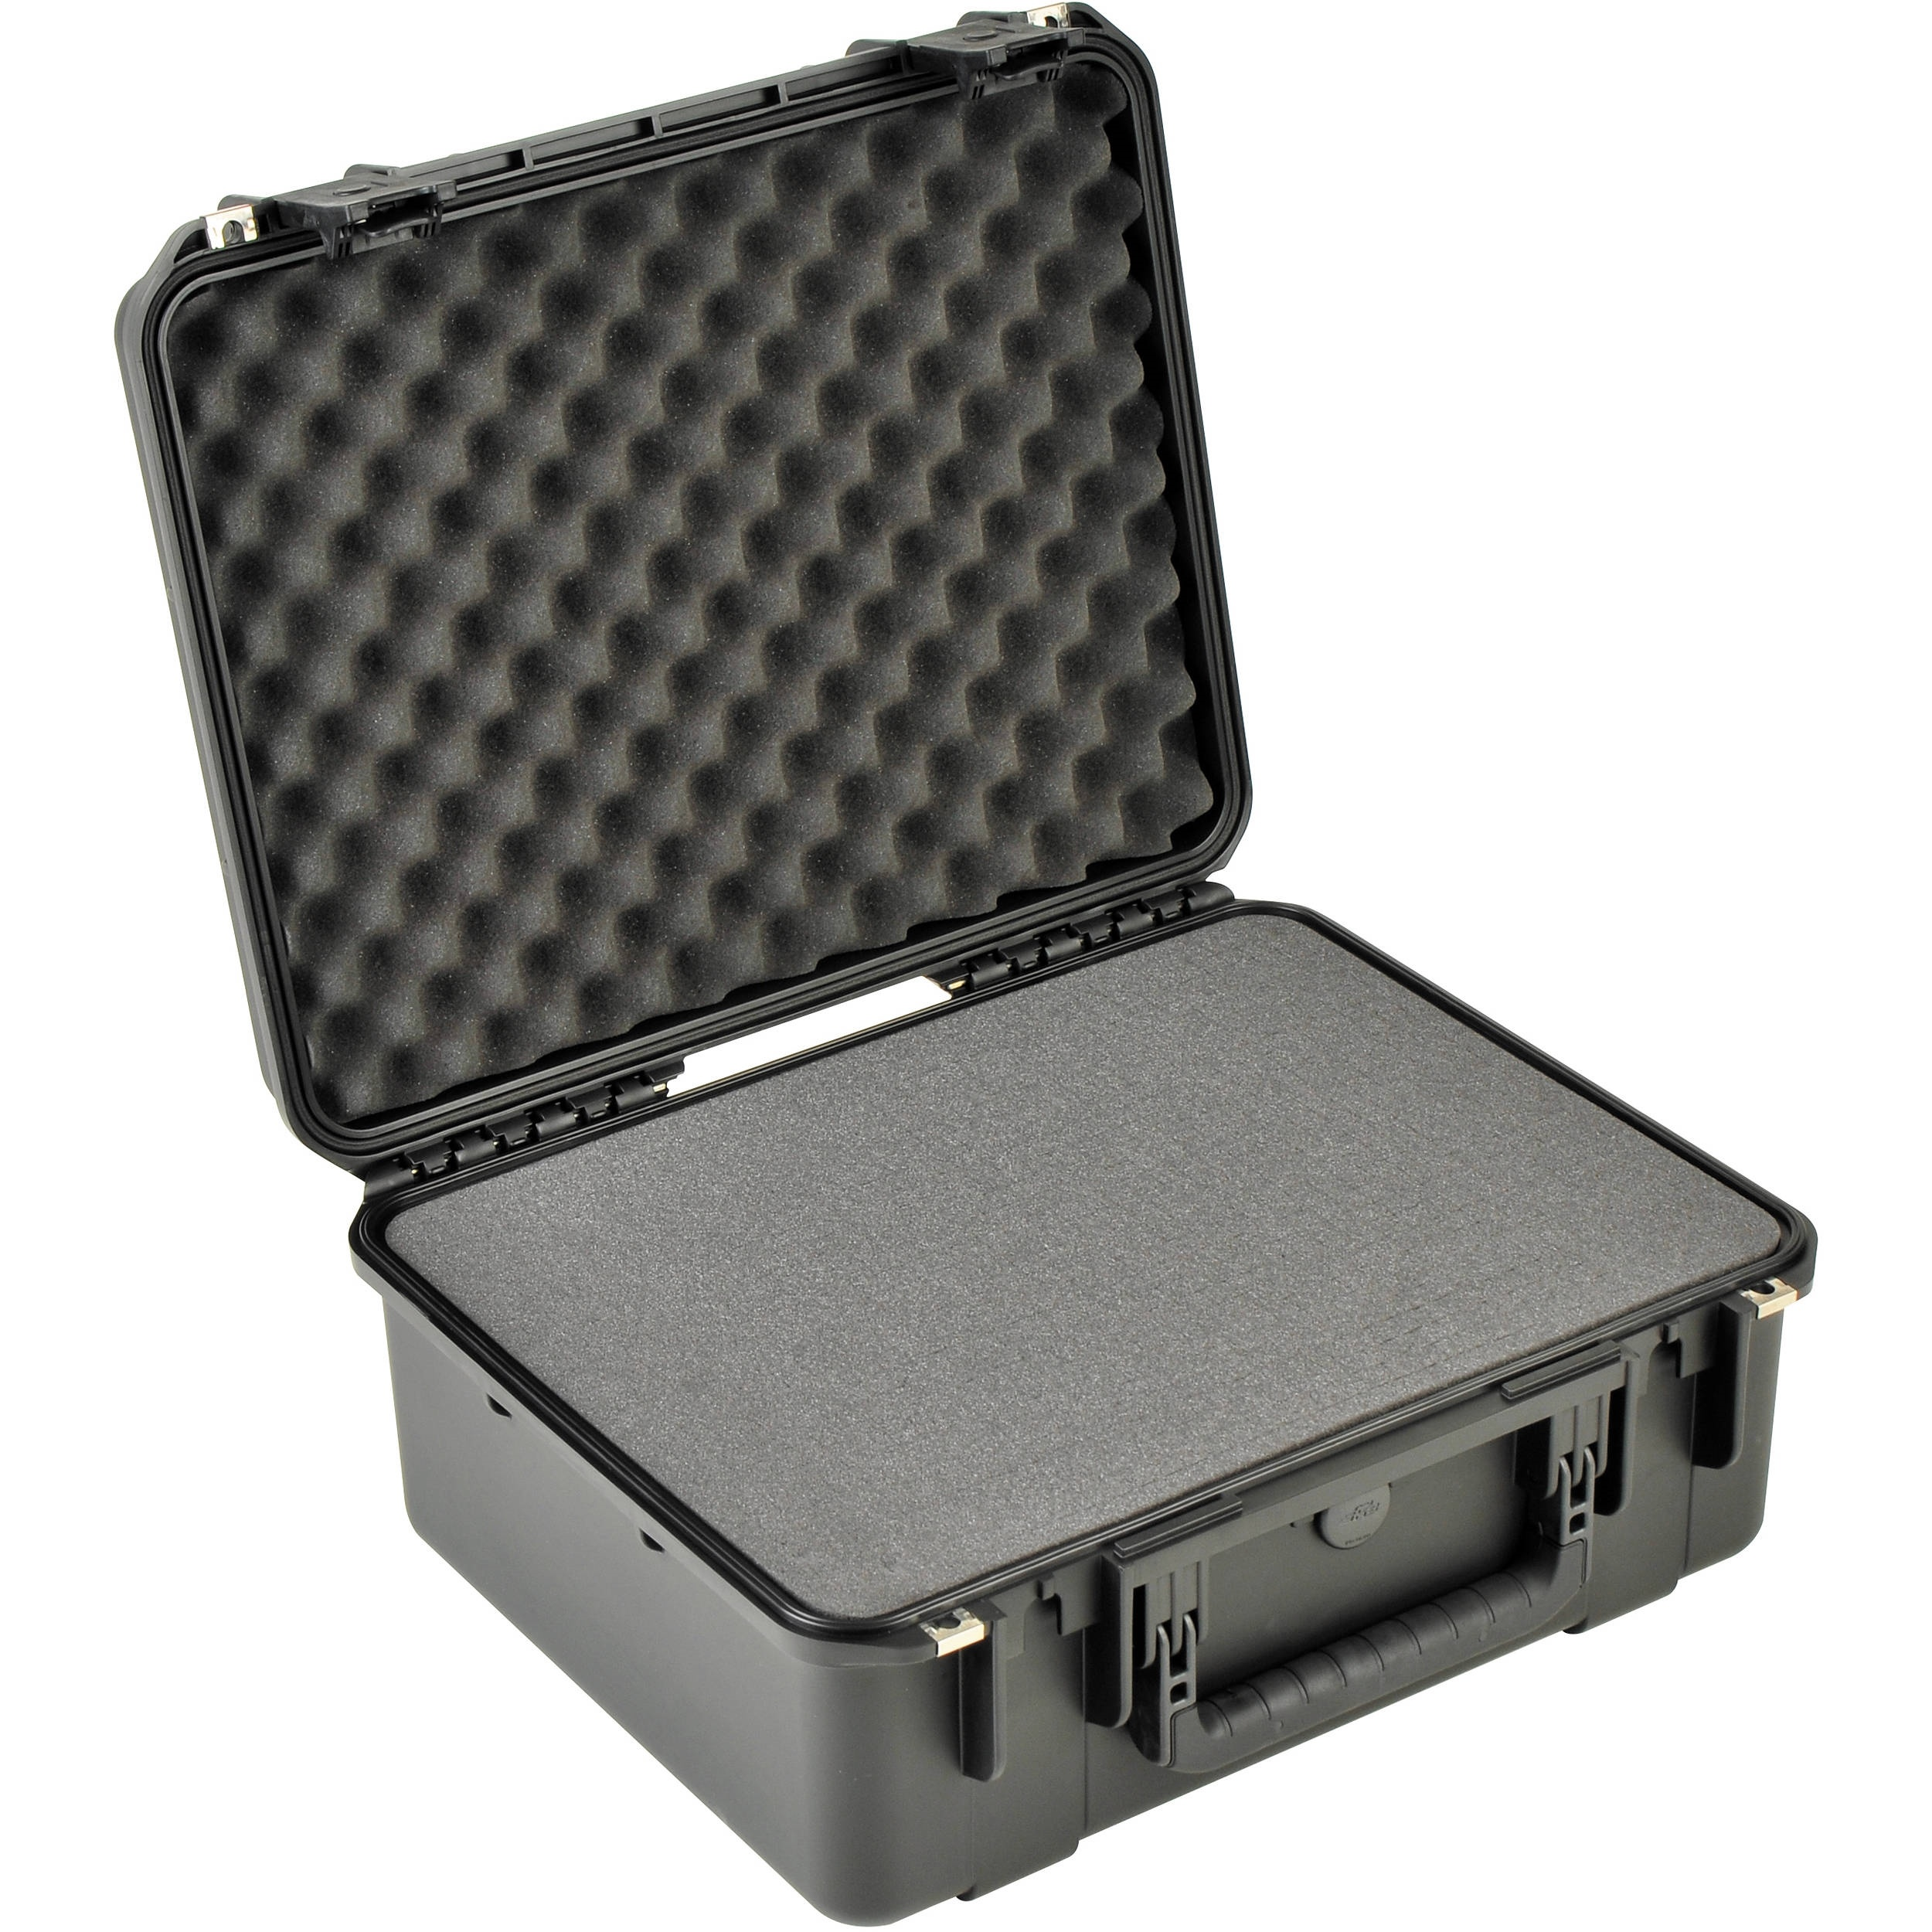 SKB 3I-1914N-8B-C Waterproof Case with Cubed Foam (42.9 x 22.4 x 51.6 cm interior)